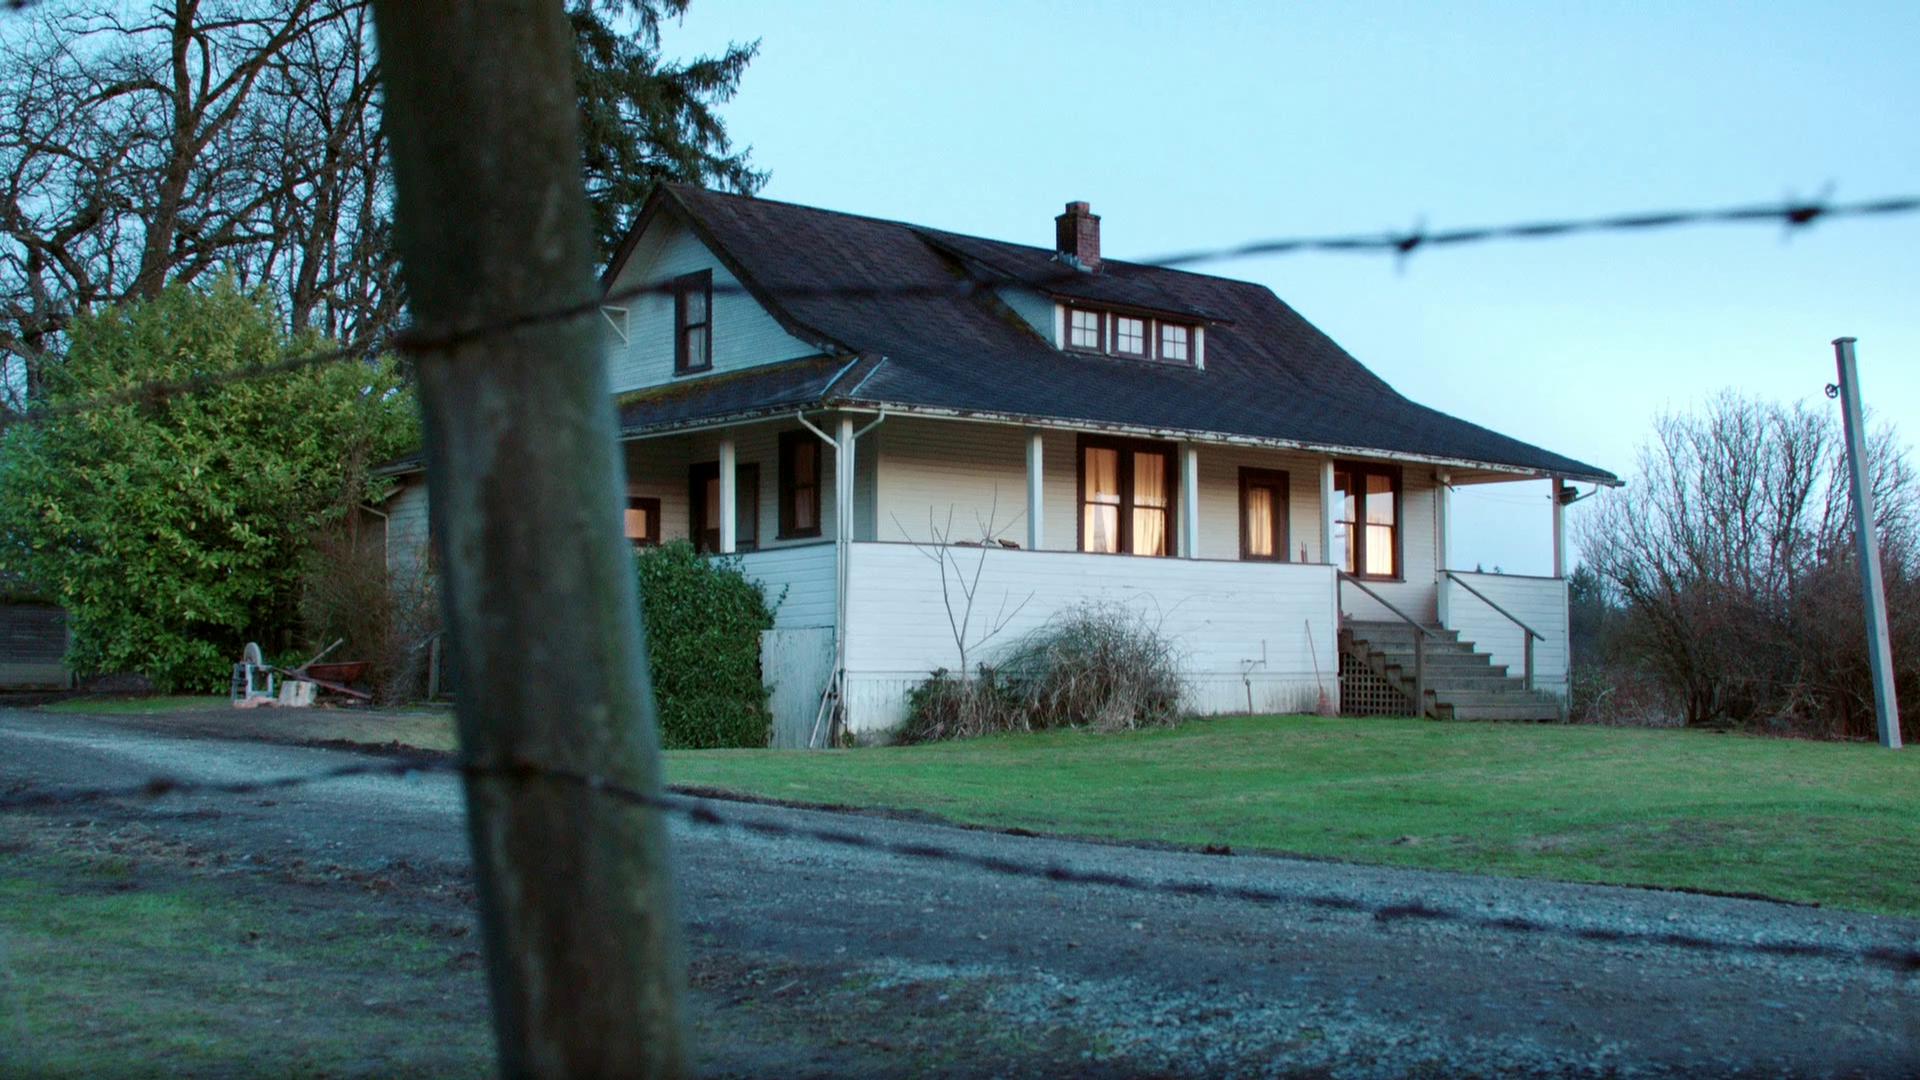 Zelenau0027s Farmhouse - Farm House PNG HD